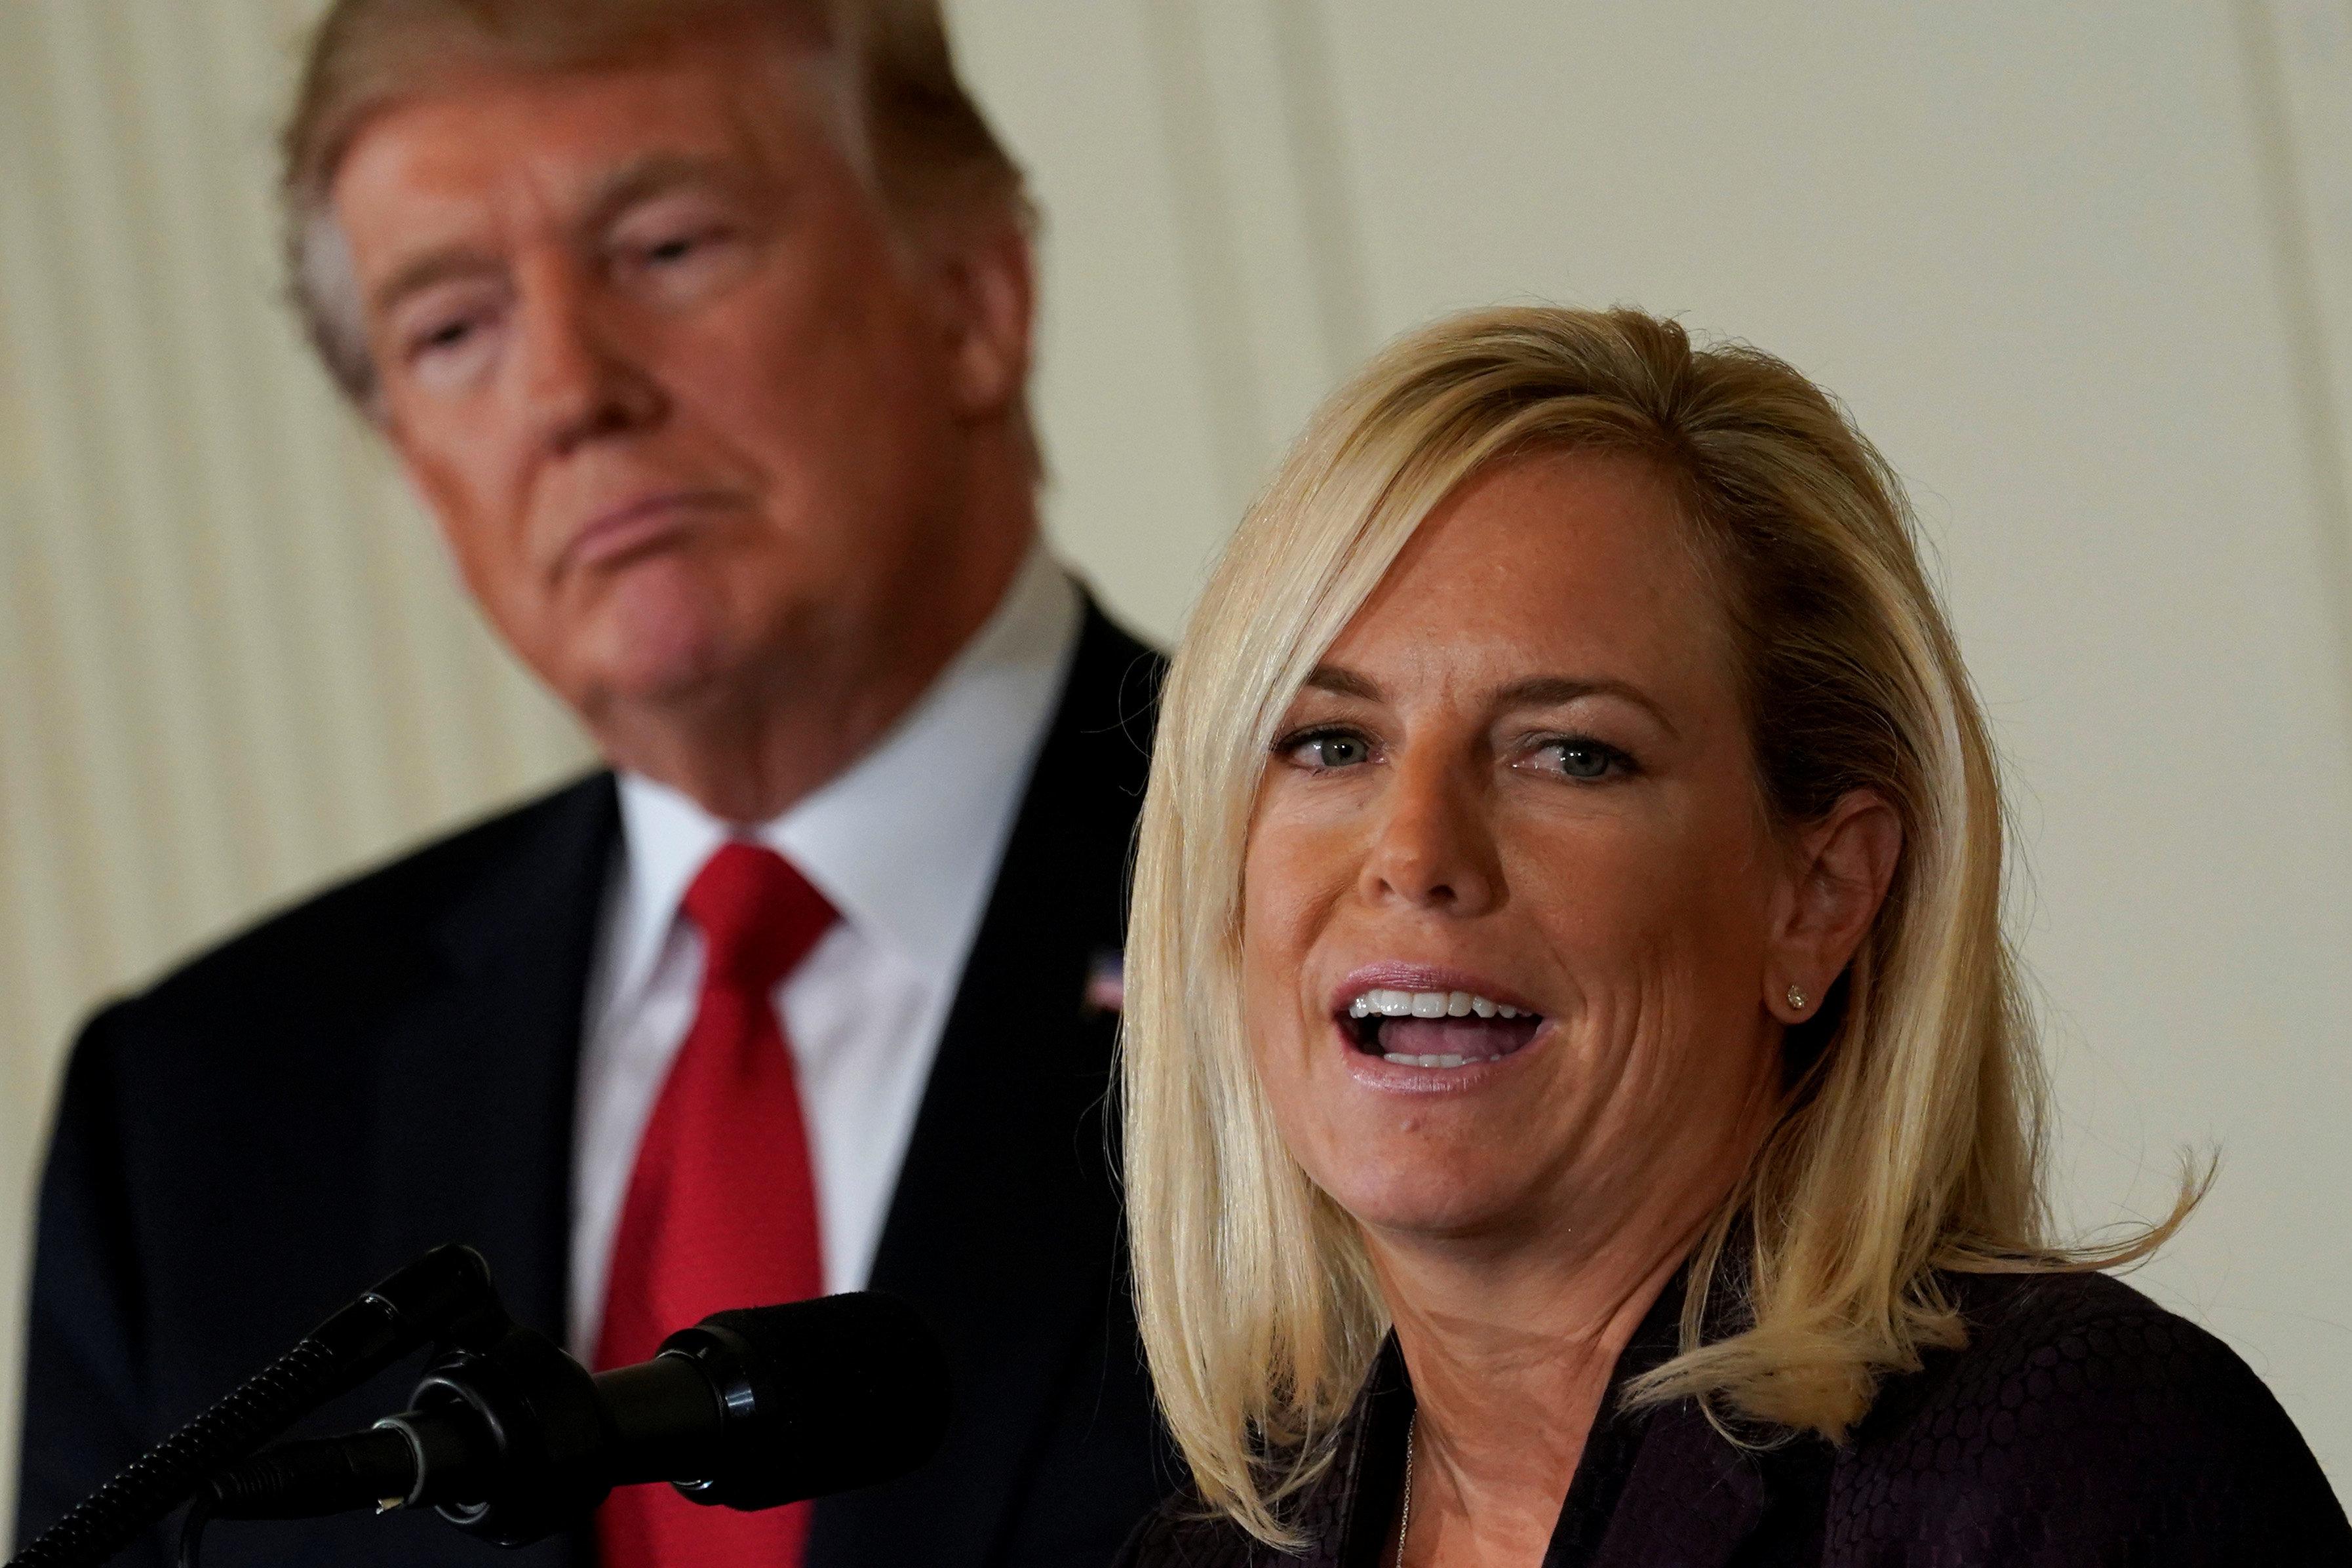 Homeland Security SecretaryKirstjen Nielsen said she takes